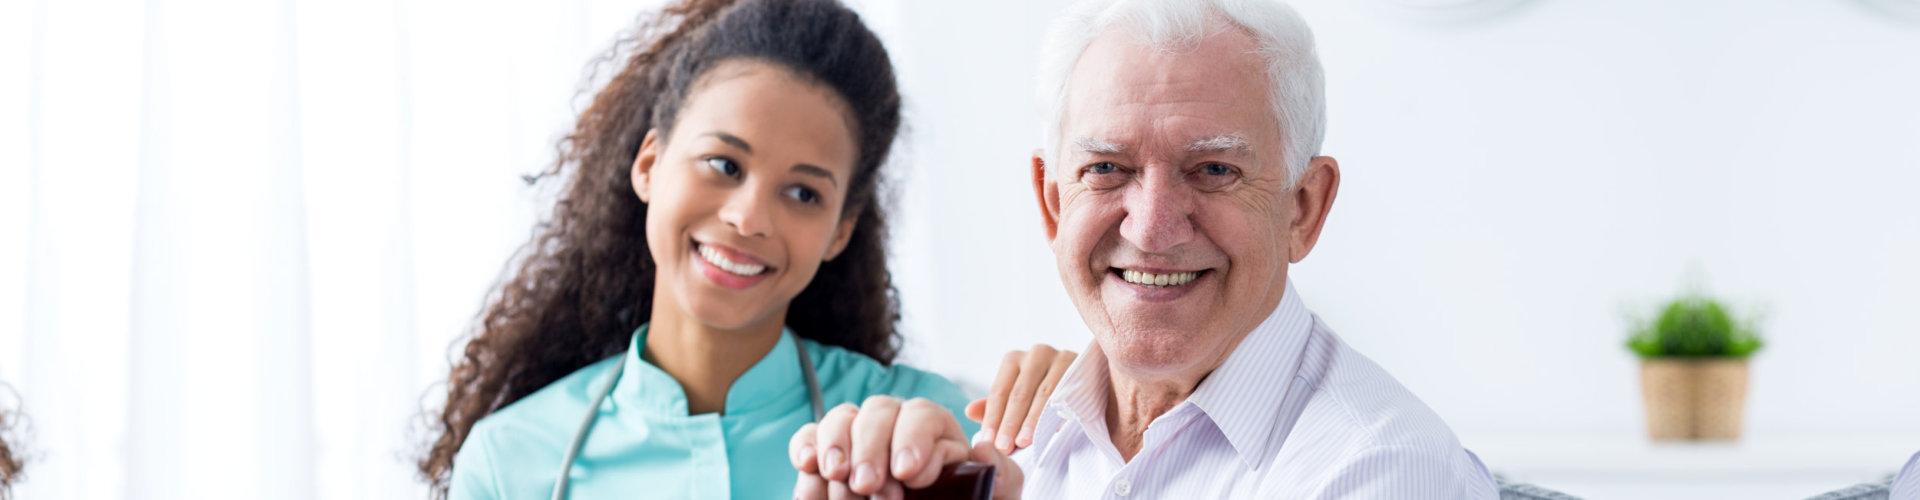 nurse smiling with her senior patient